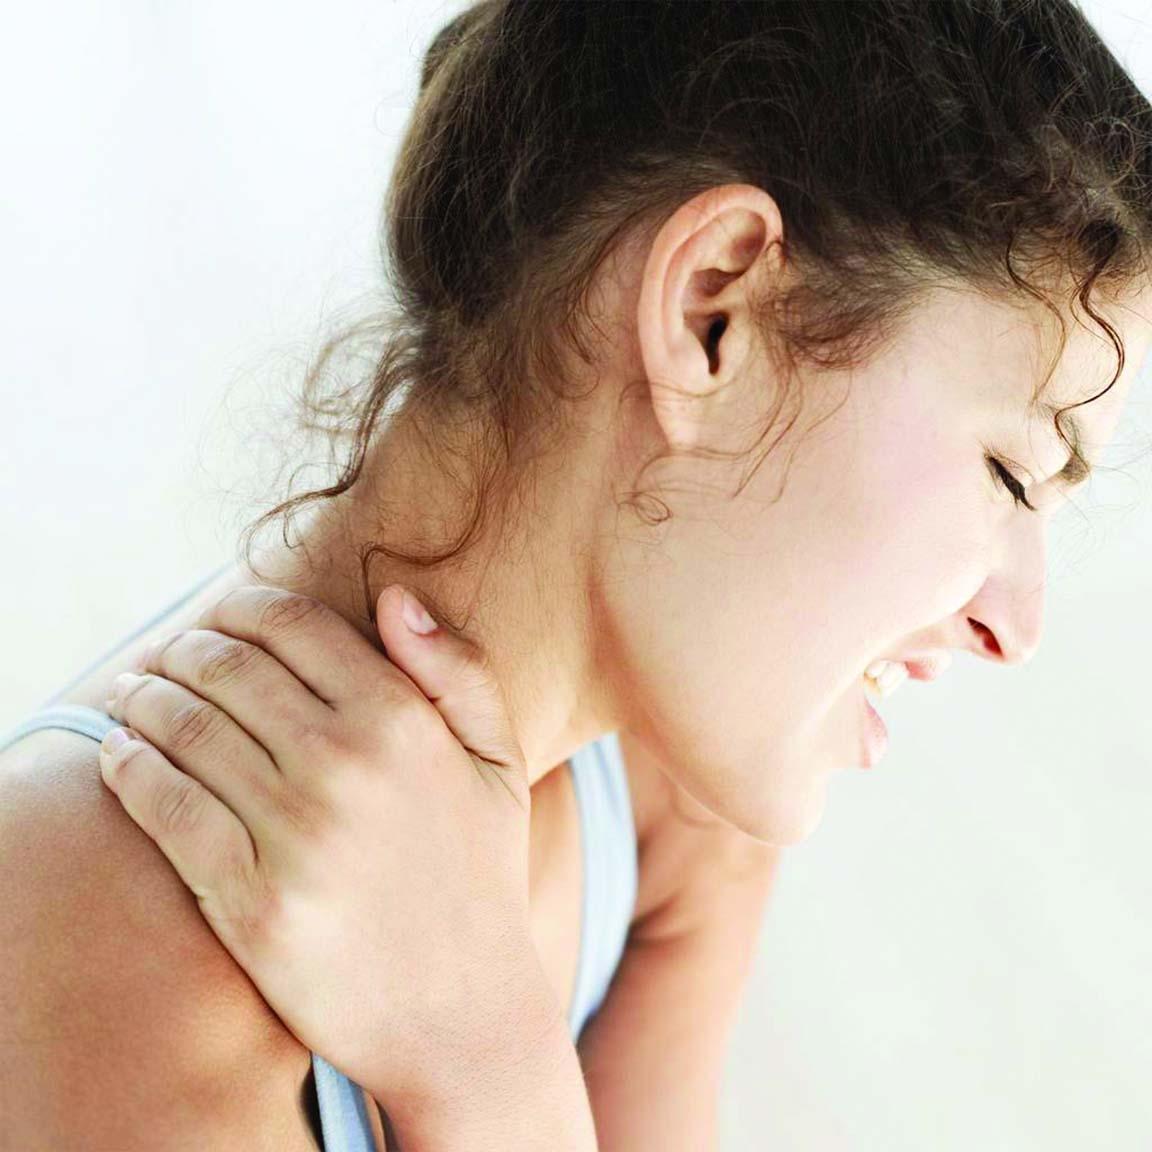 Car crash victims struggle with chronic neck pain